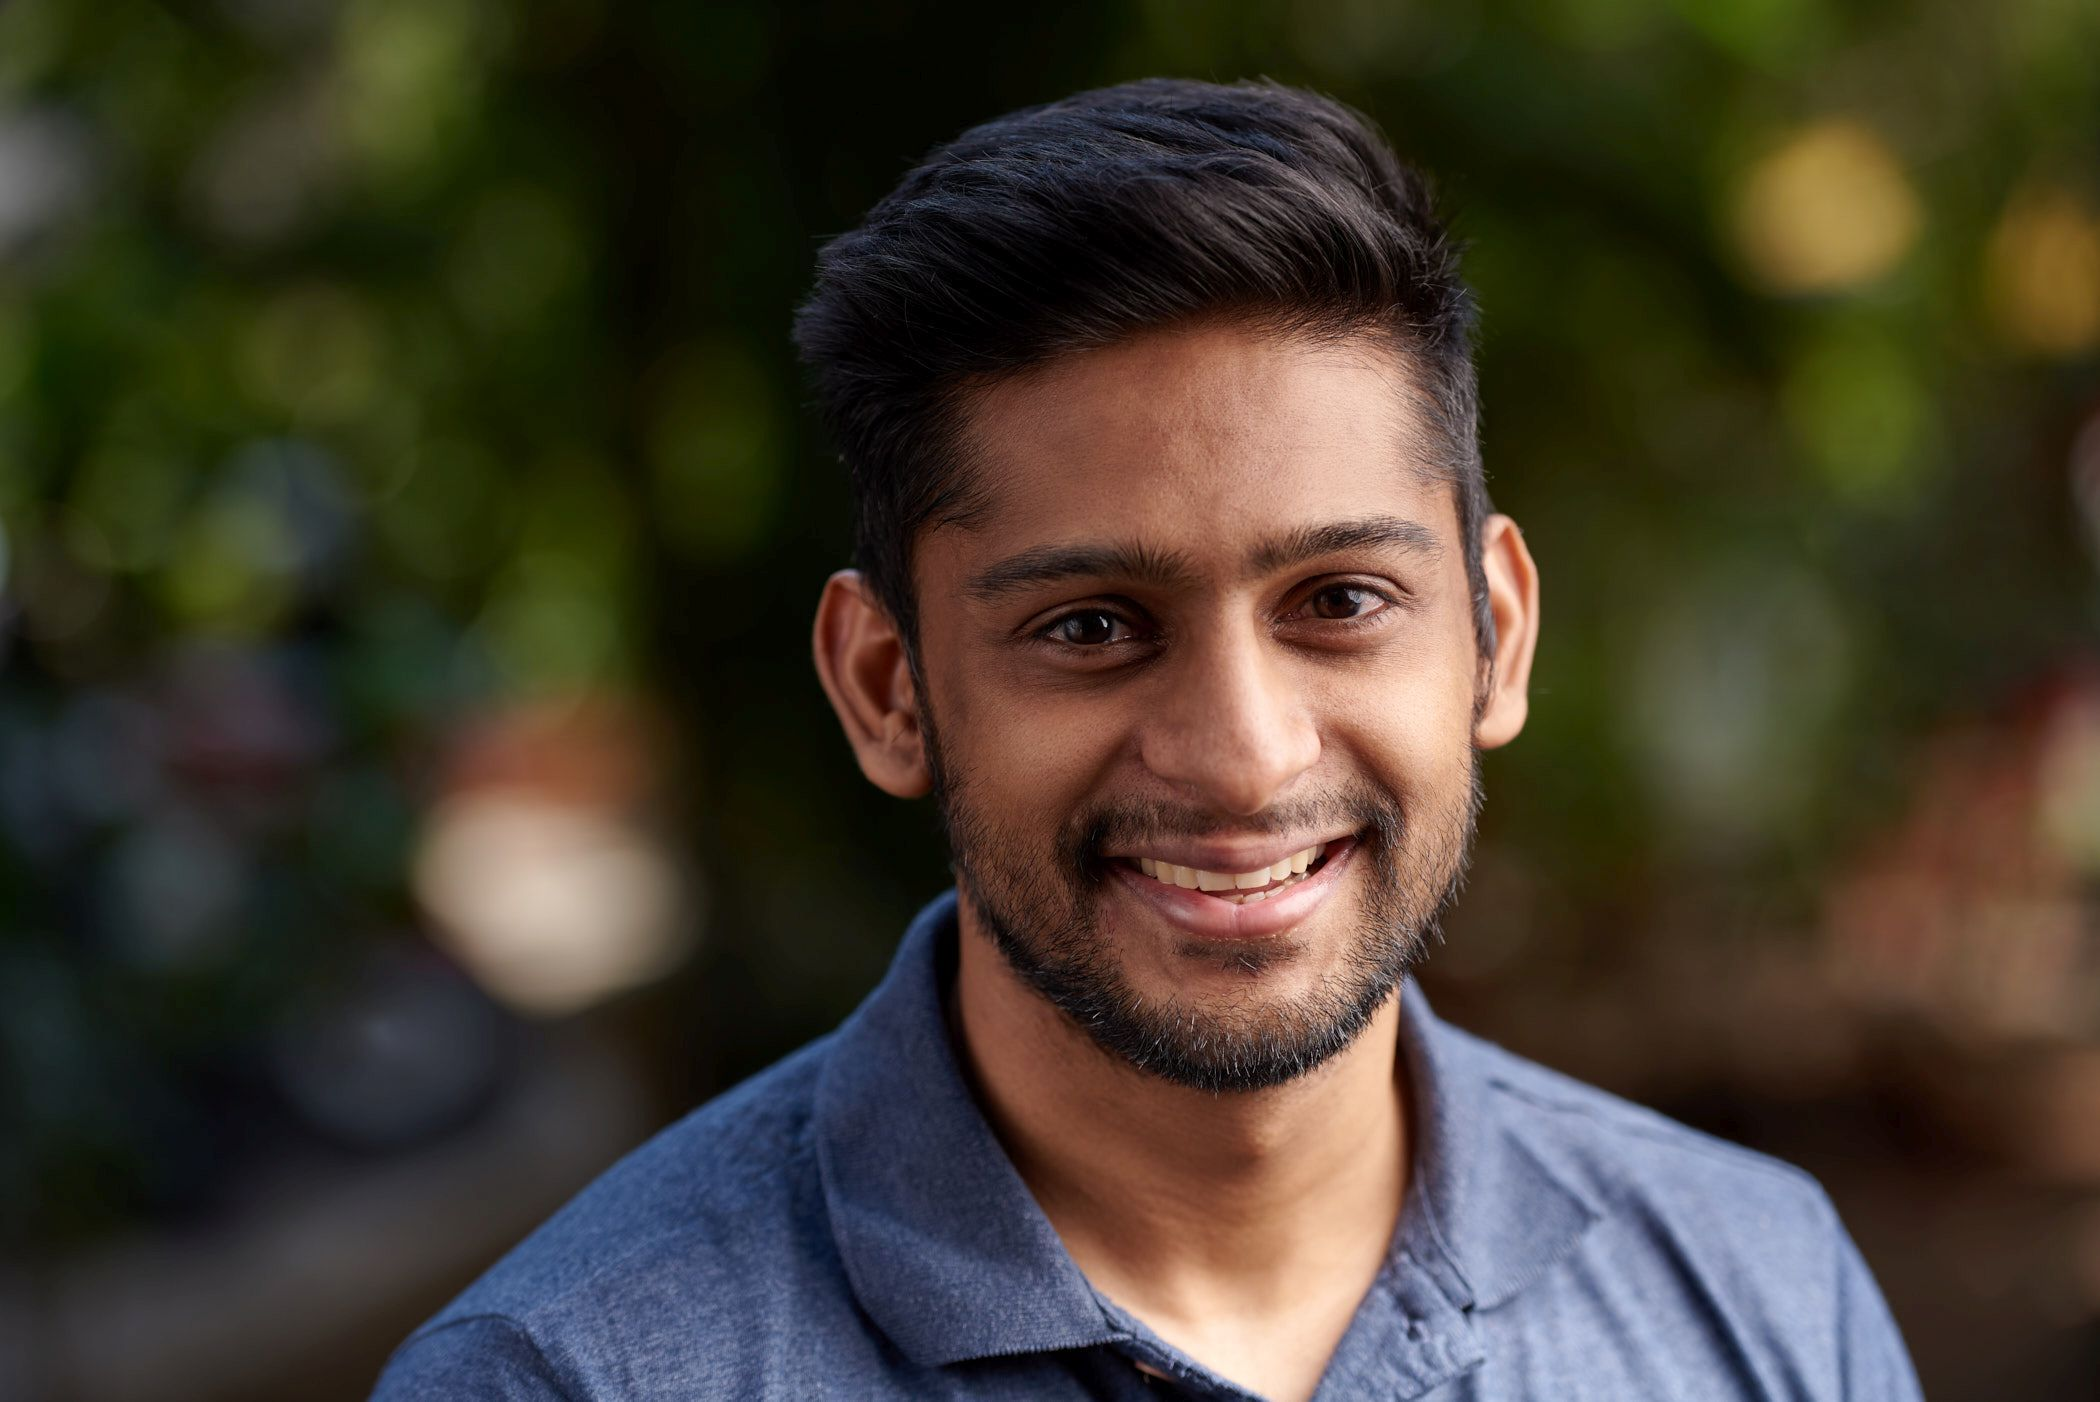 Suman Das Hacker Noon profile picture